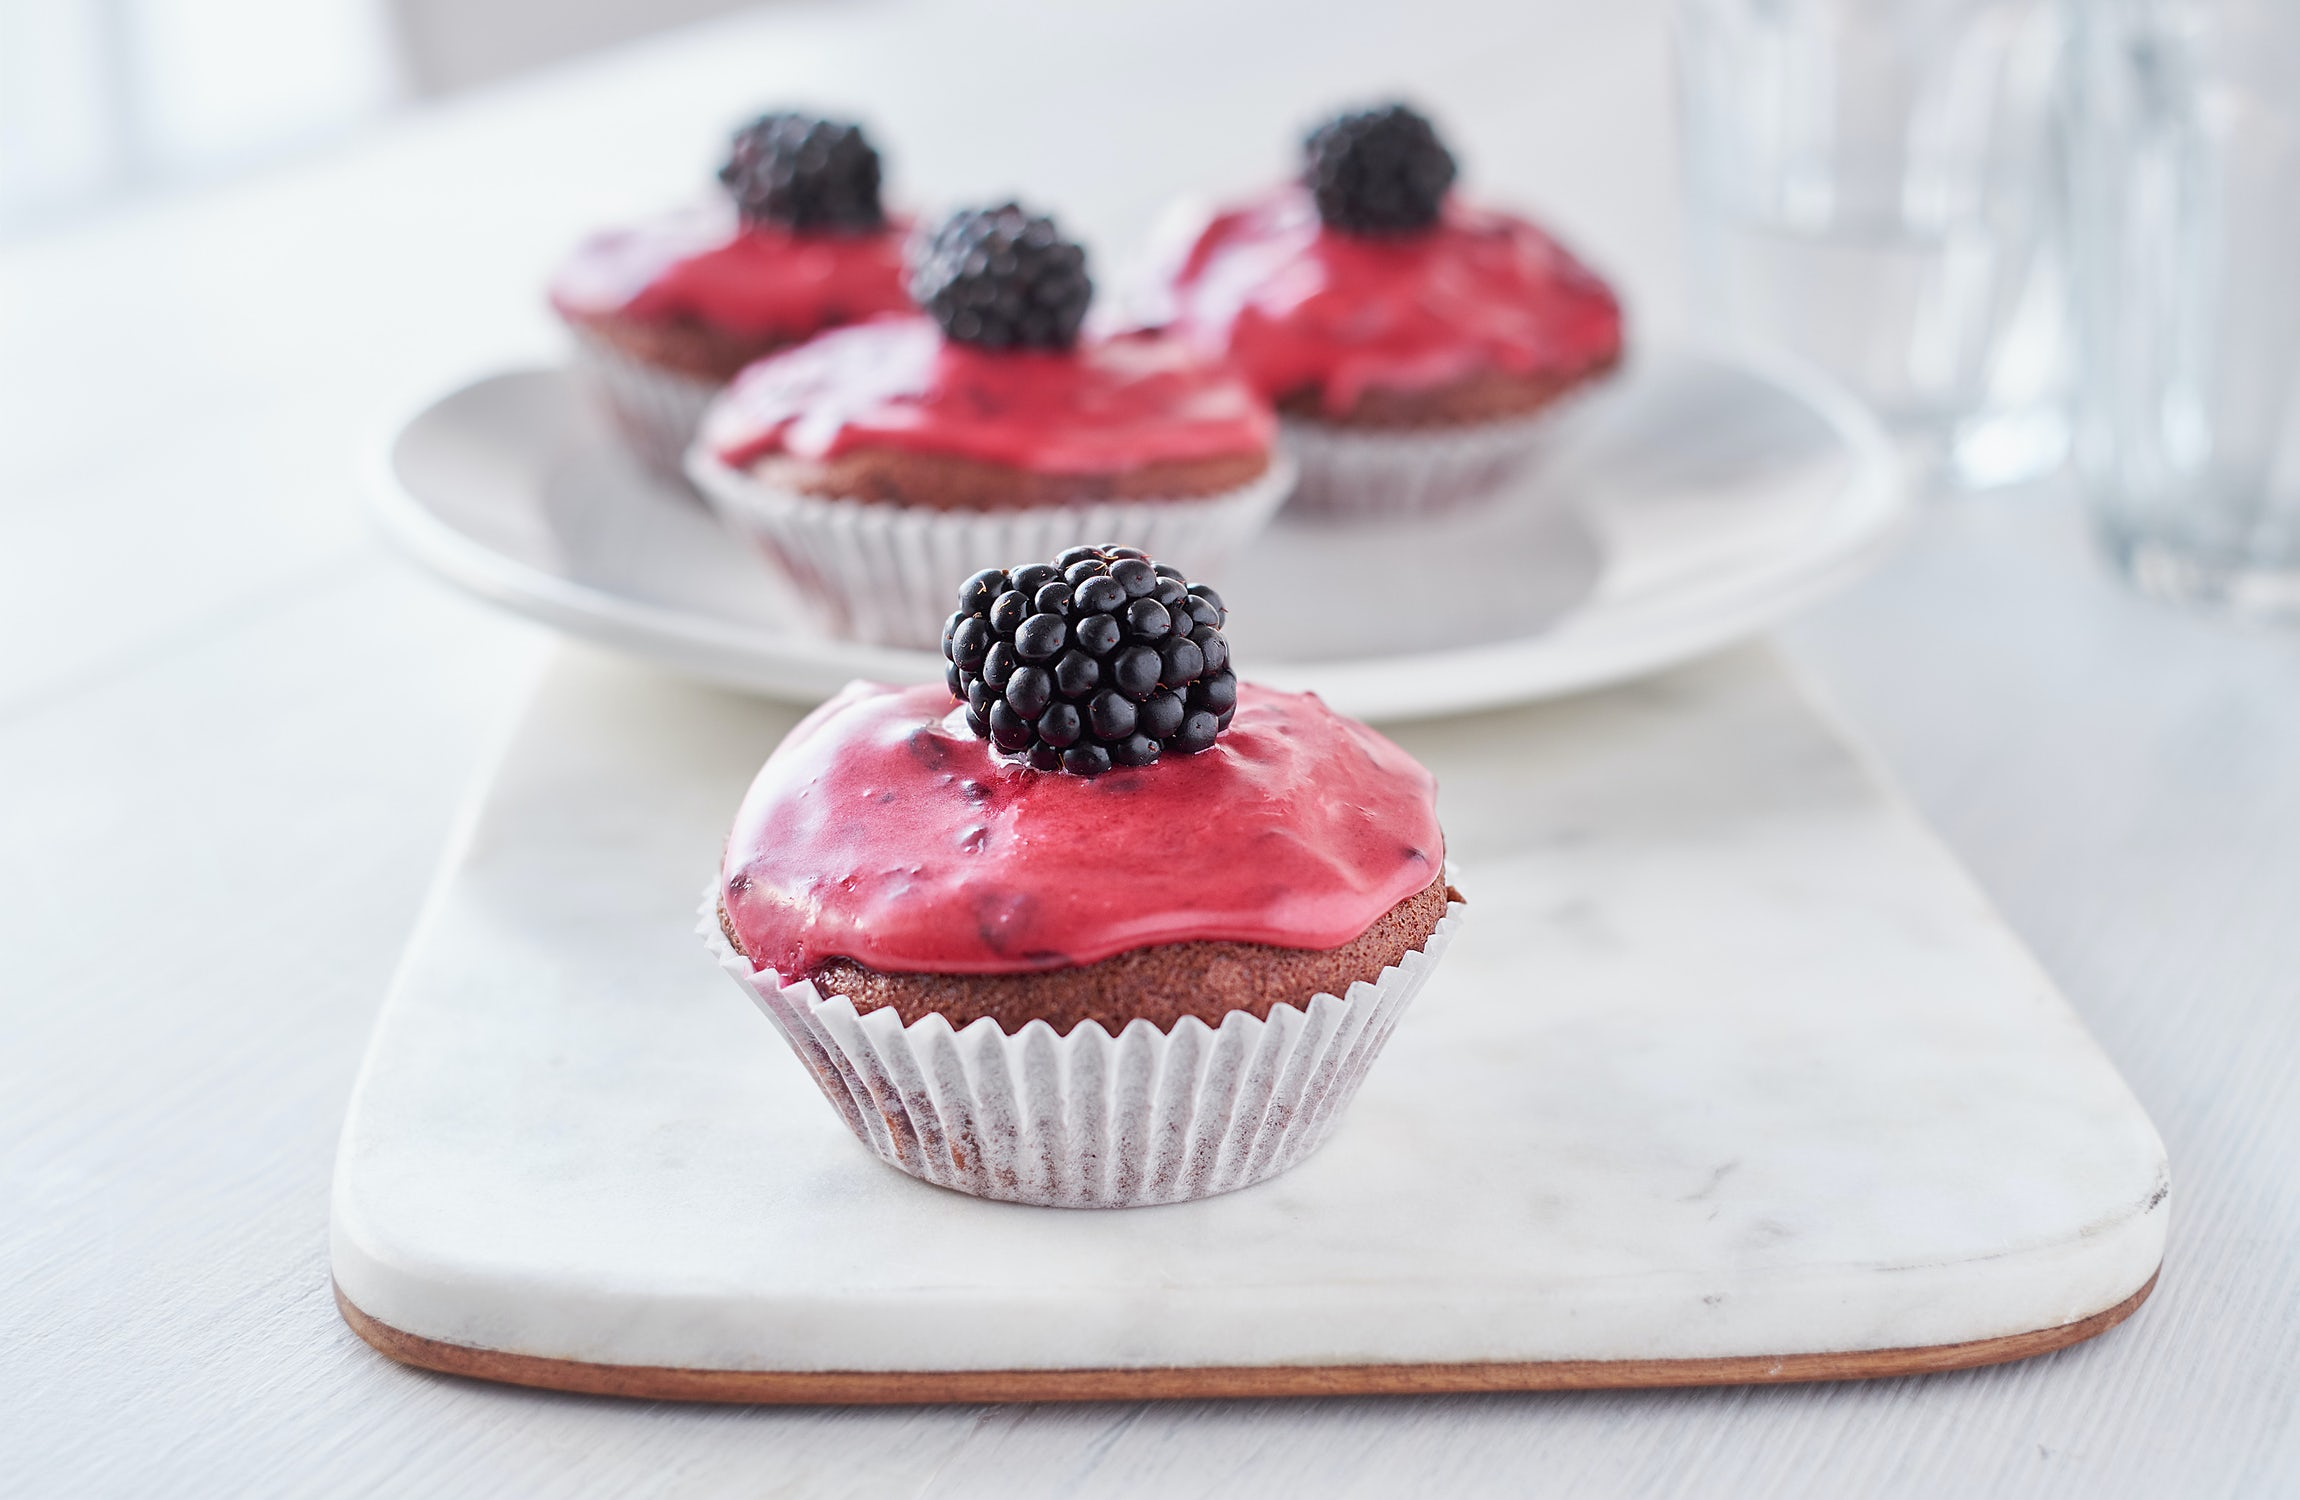 Vegan-licious Blackberry Cupcakes